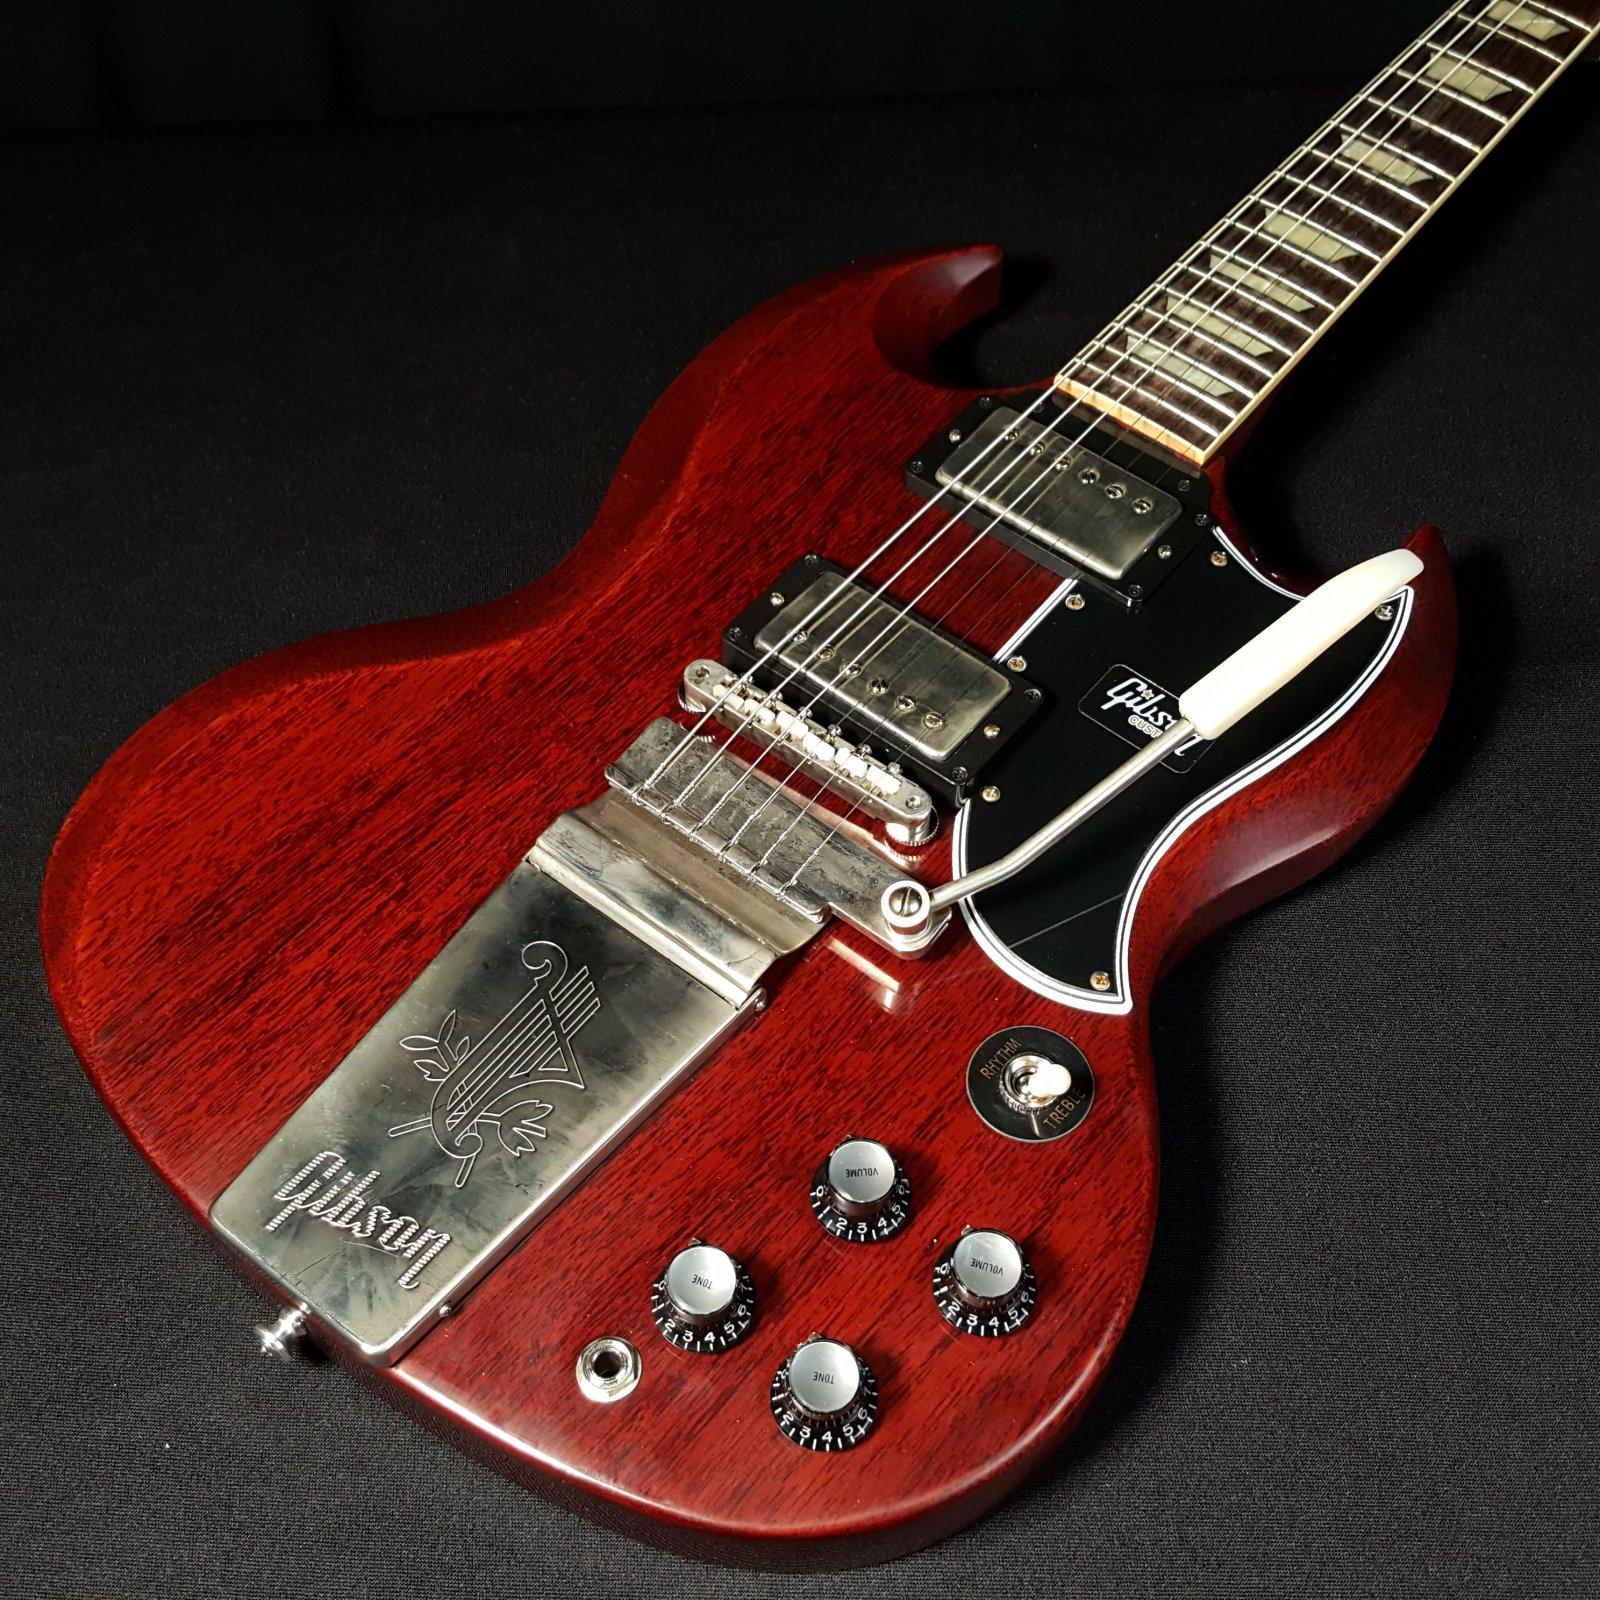 Gibson Custom Shop 1964 SG Standard Reissue VOS W/ Maestro Vibrola